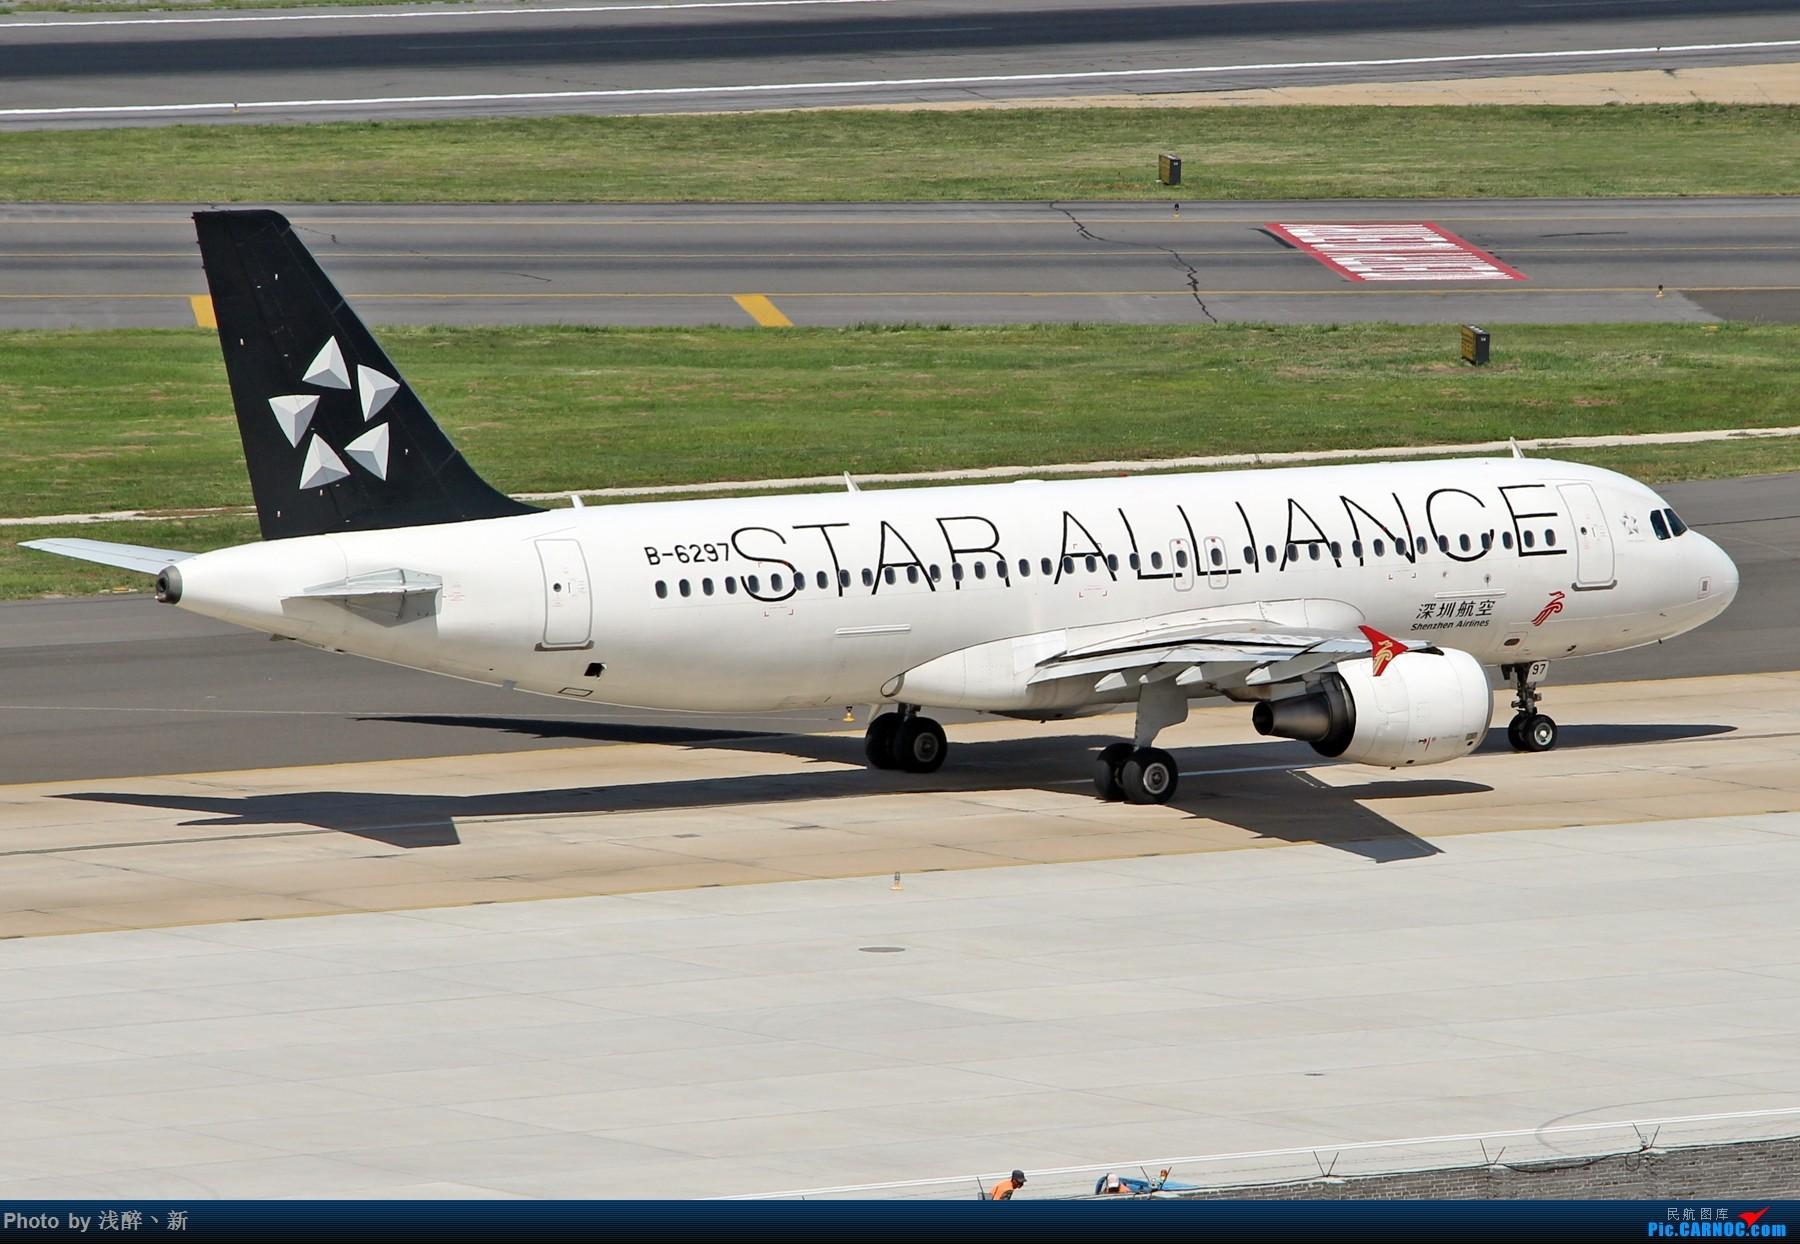 Re:[原创]DLC 8.26 日常[补] AIRBUS A320-200 B-6297 中国大连国际机场